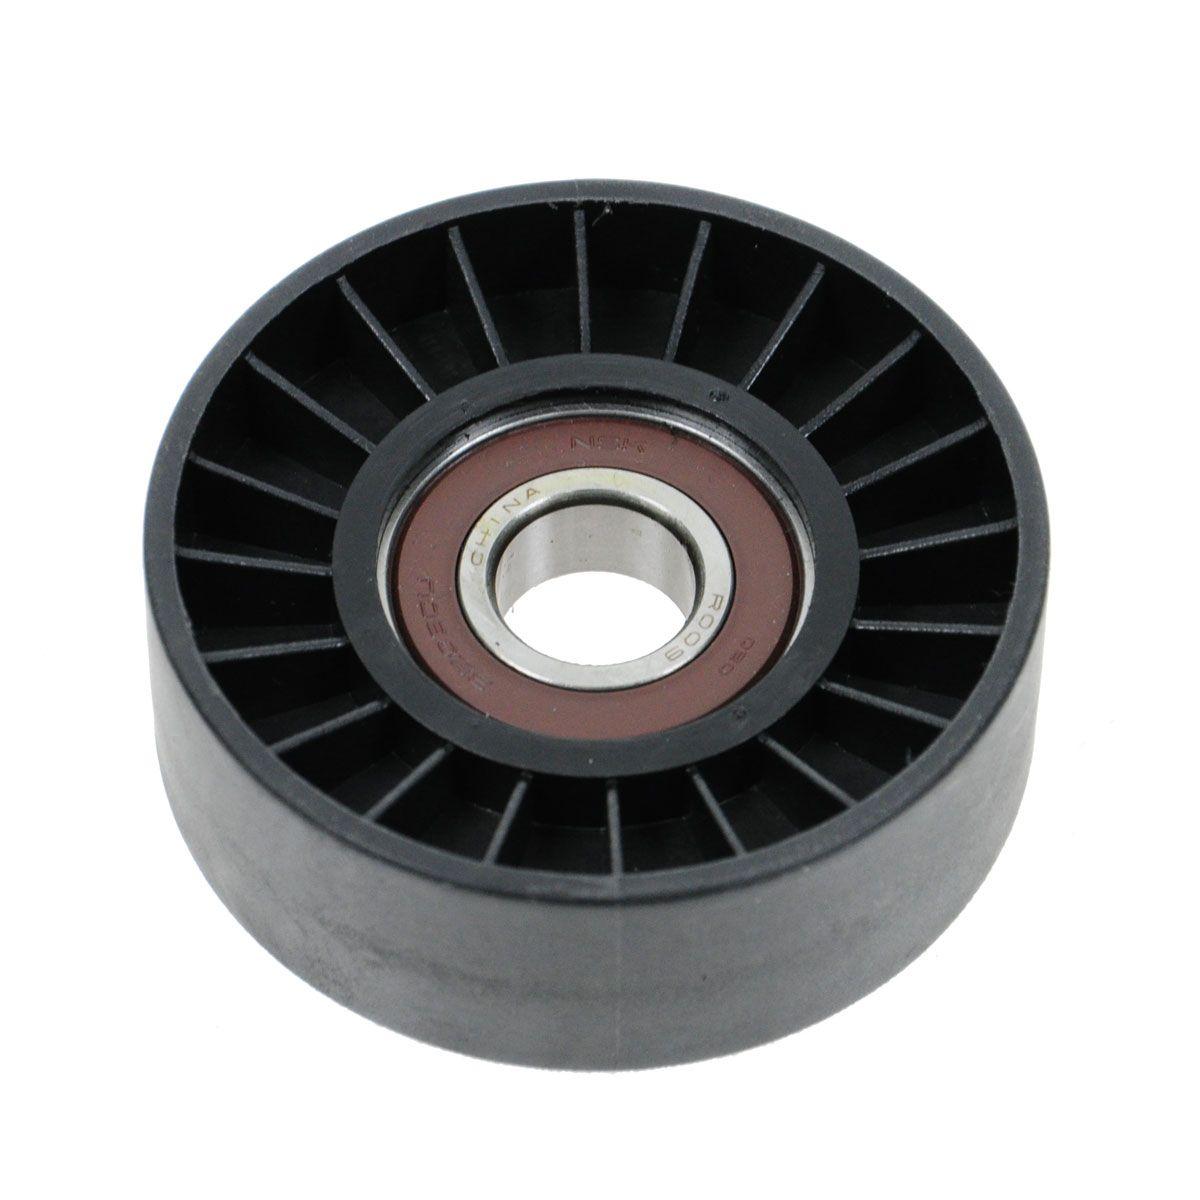 Serpentine Belt Pulley Bearing Noise : Serpentine belt idler pulley for lumina taurus windstar